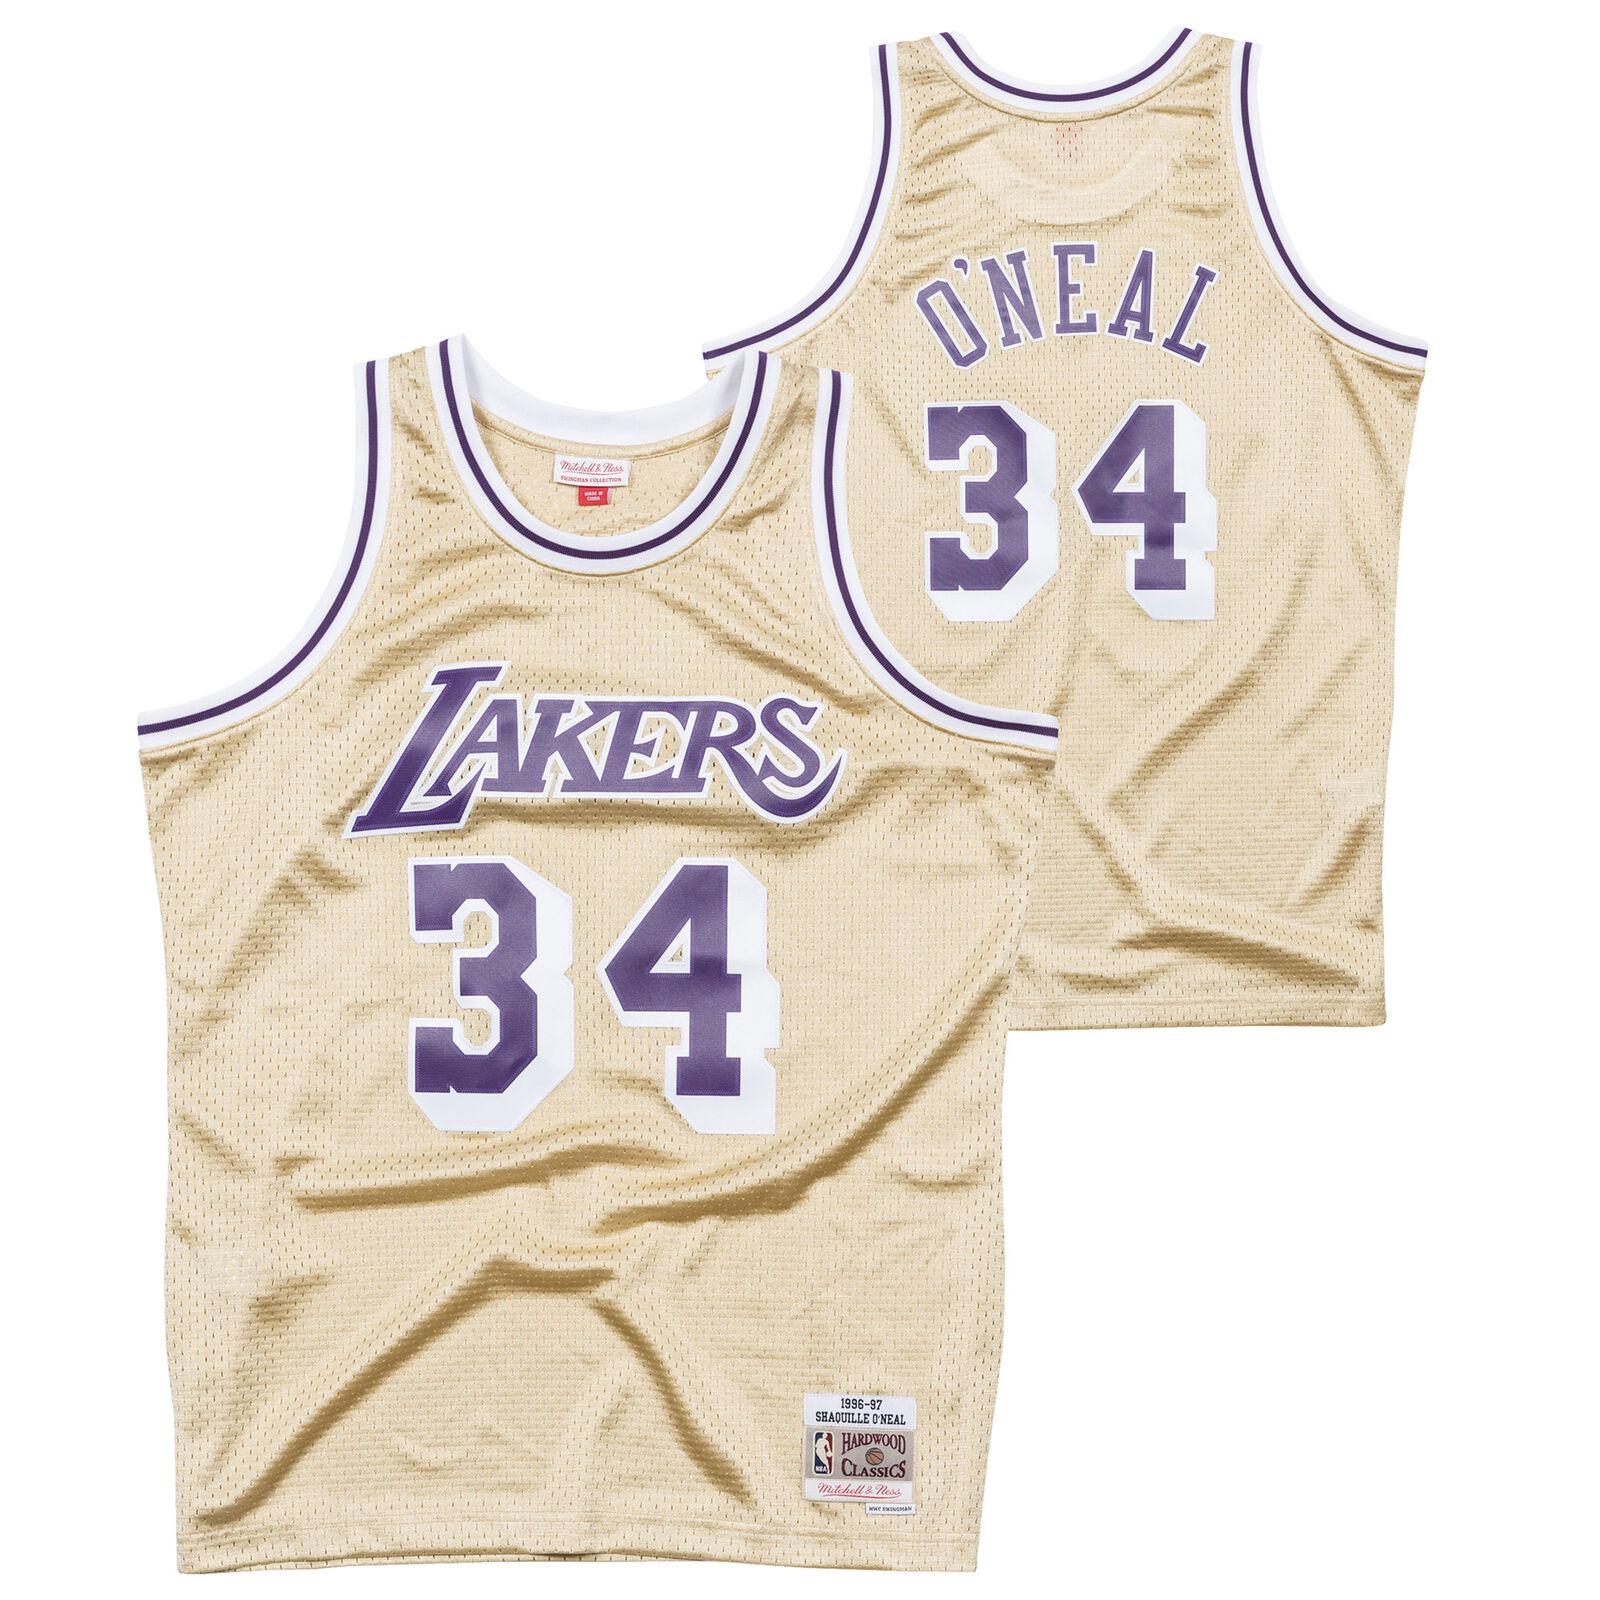 NBA Los Angeles Lakers Shaquille O Neal Neal Neal 1997 Gold Trikot Shirt Ärmellos Herren  | Die Farbe ist sehr auffällig  8e8cb4